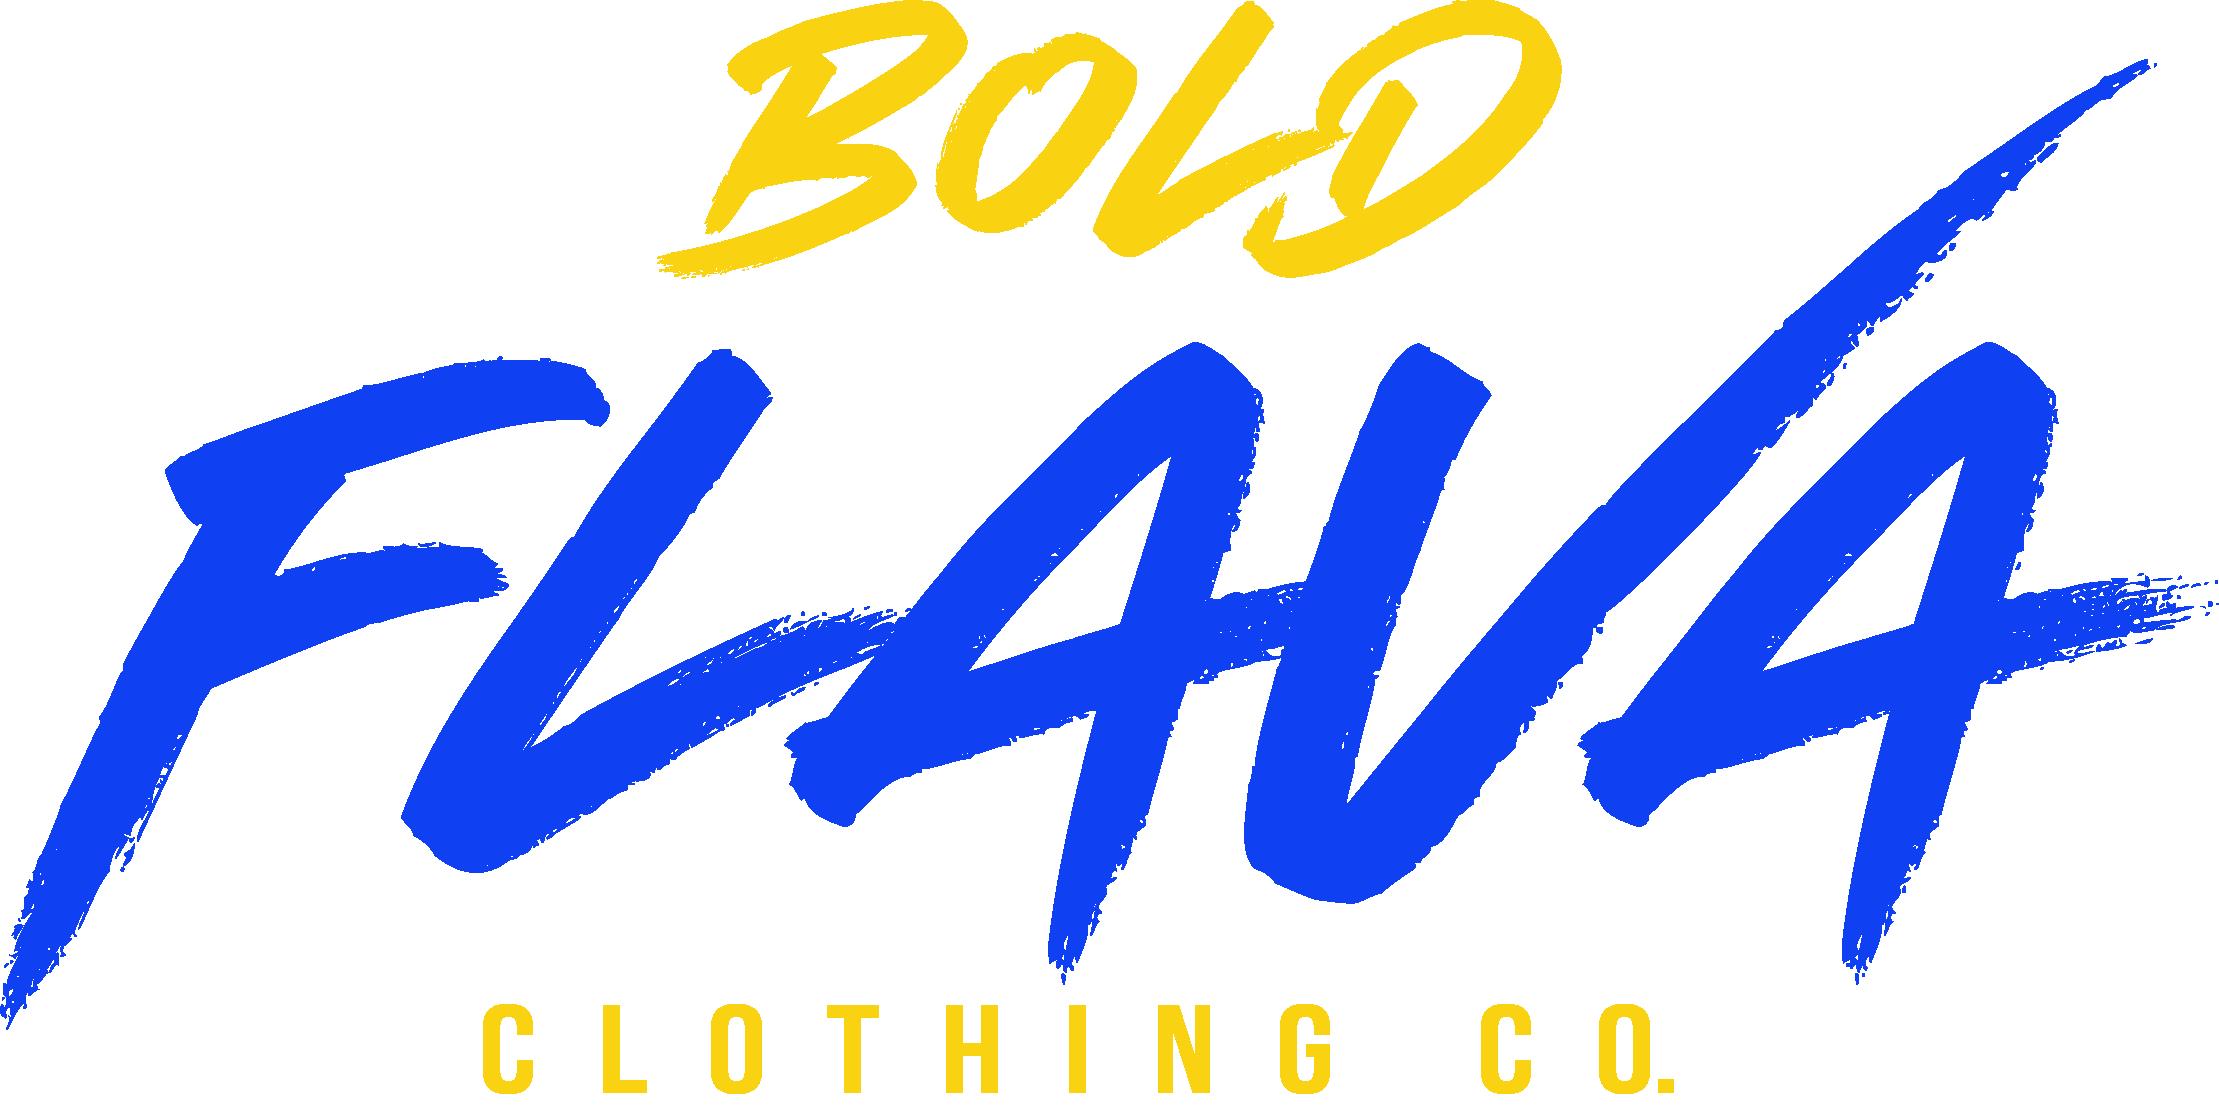 Bold Flava Clothing Co.